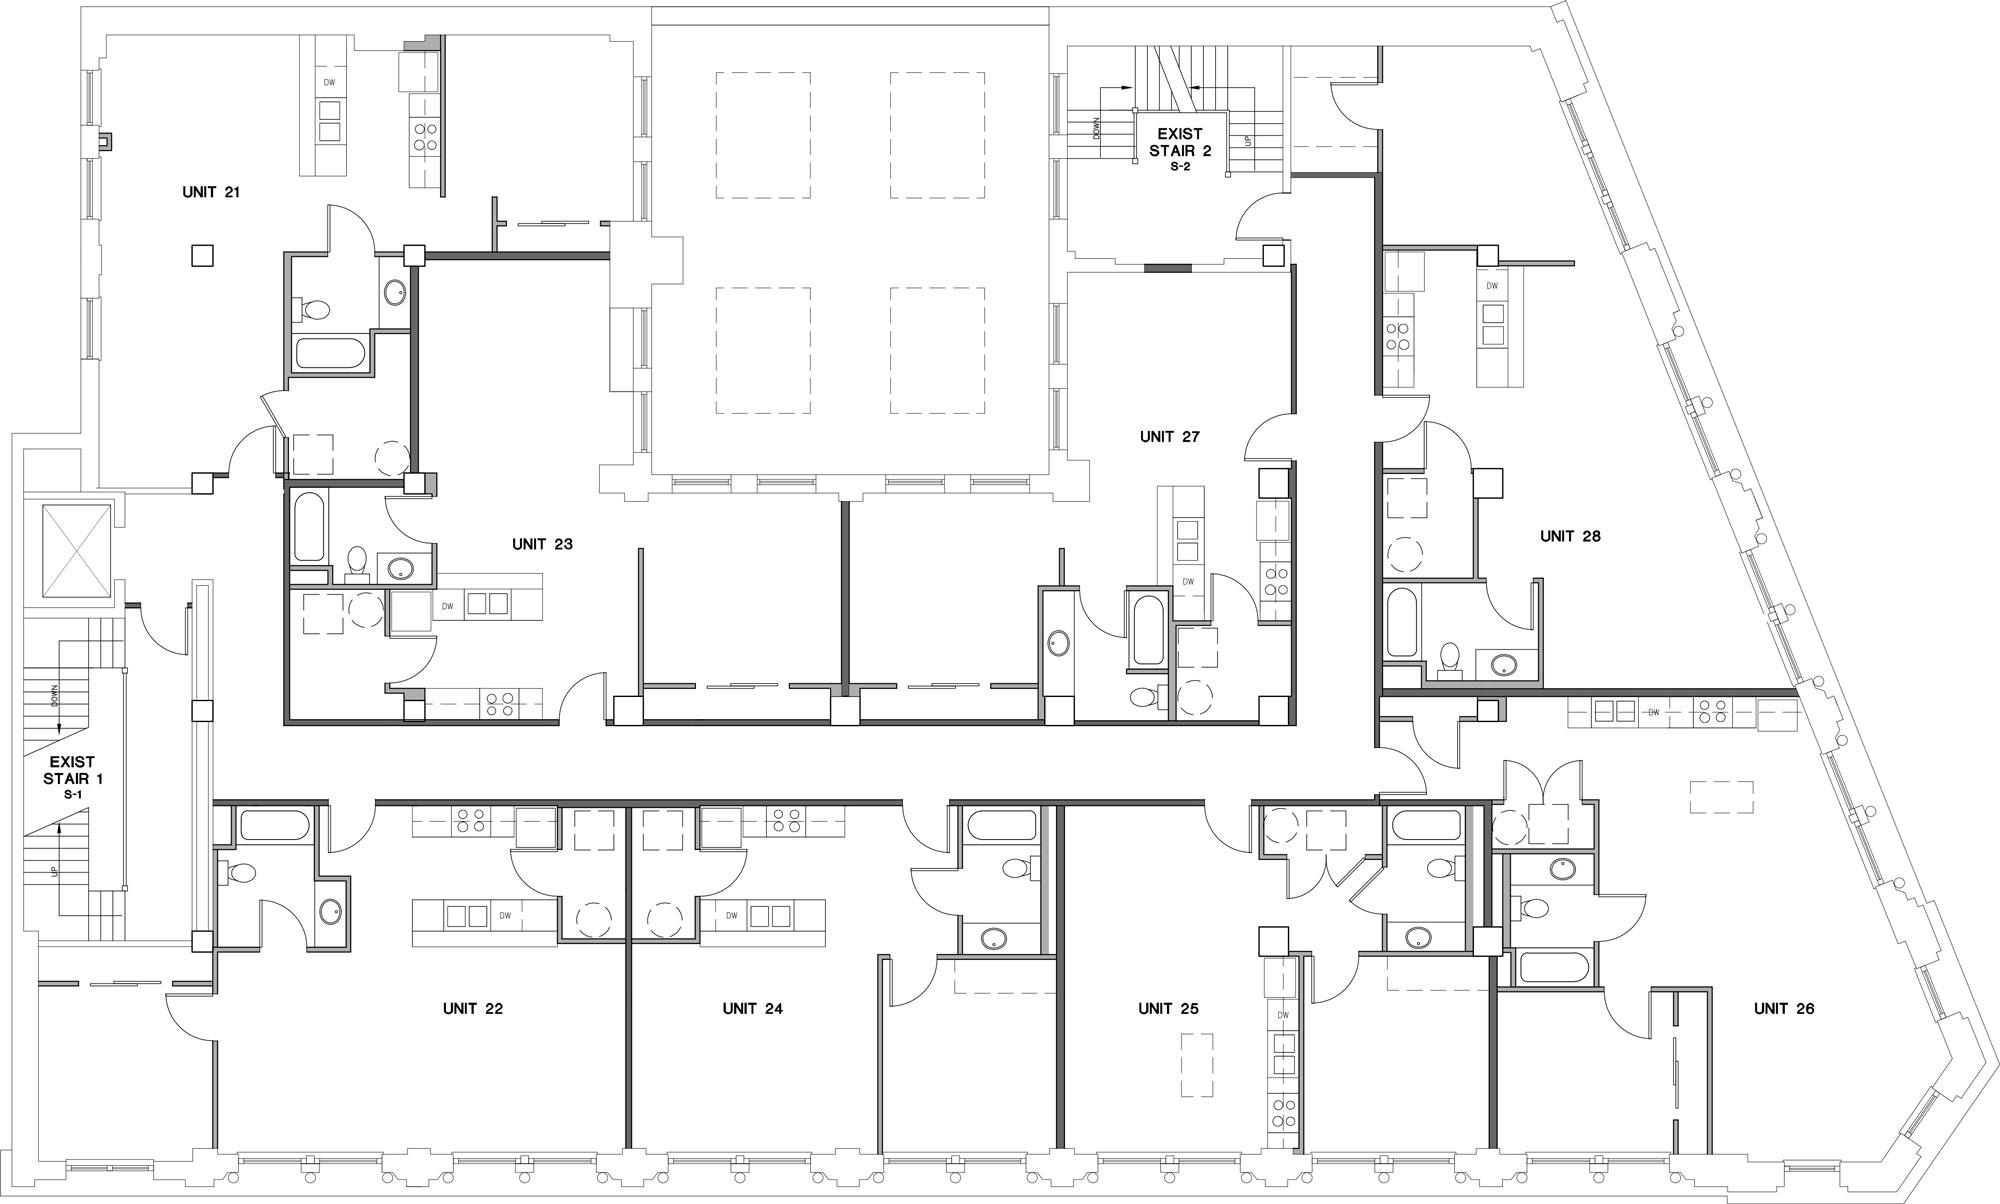 Mutual Building Second Floor Plan